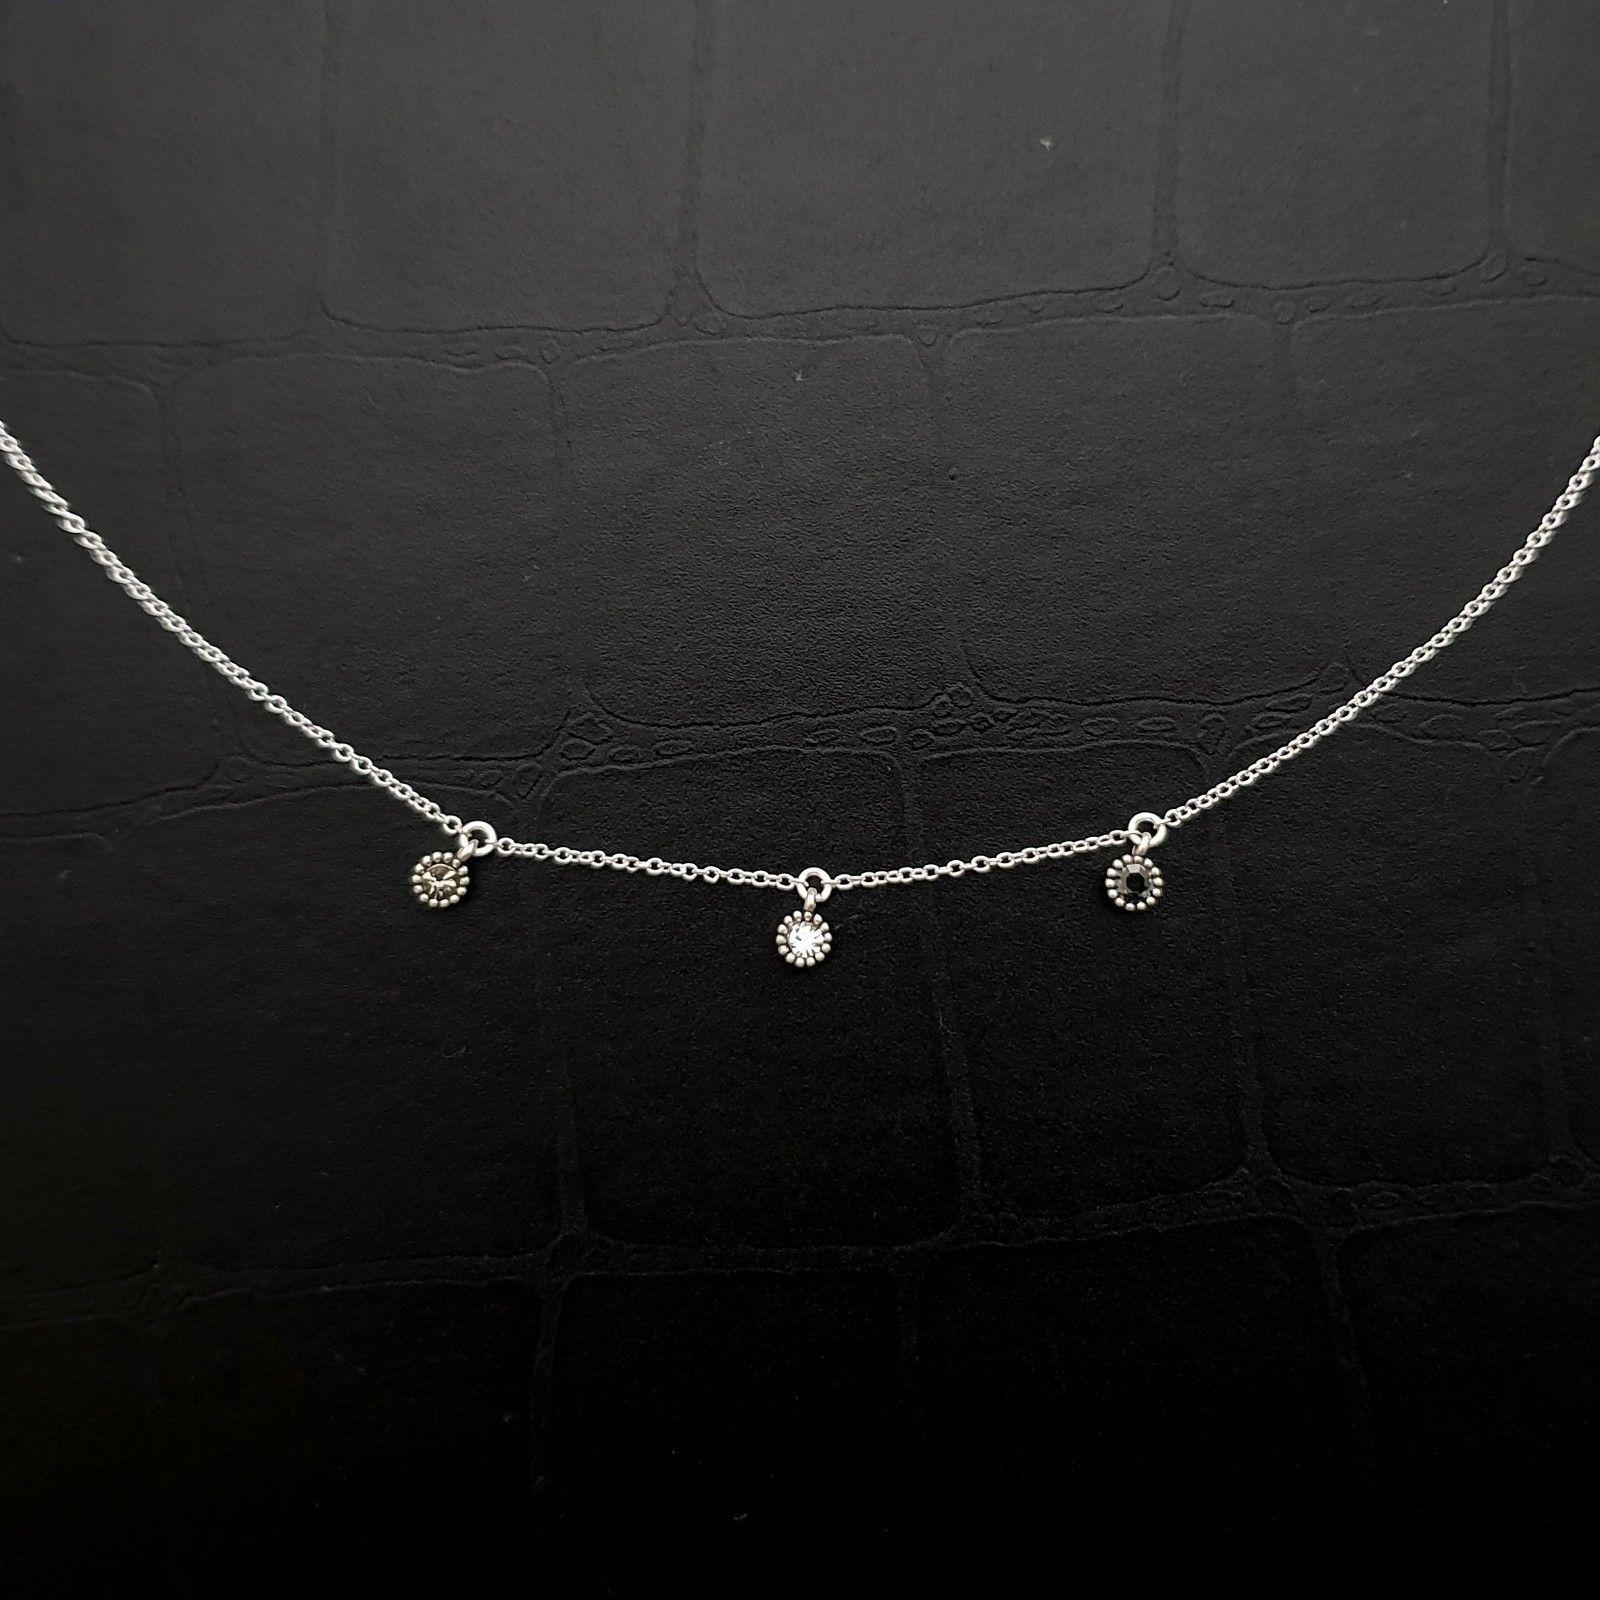 Tiny Three Circle Round Pendant Choker Necklace 925 Sterling Silver Rhinestone